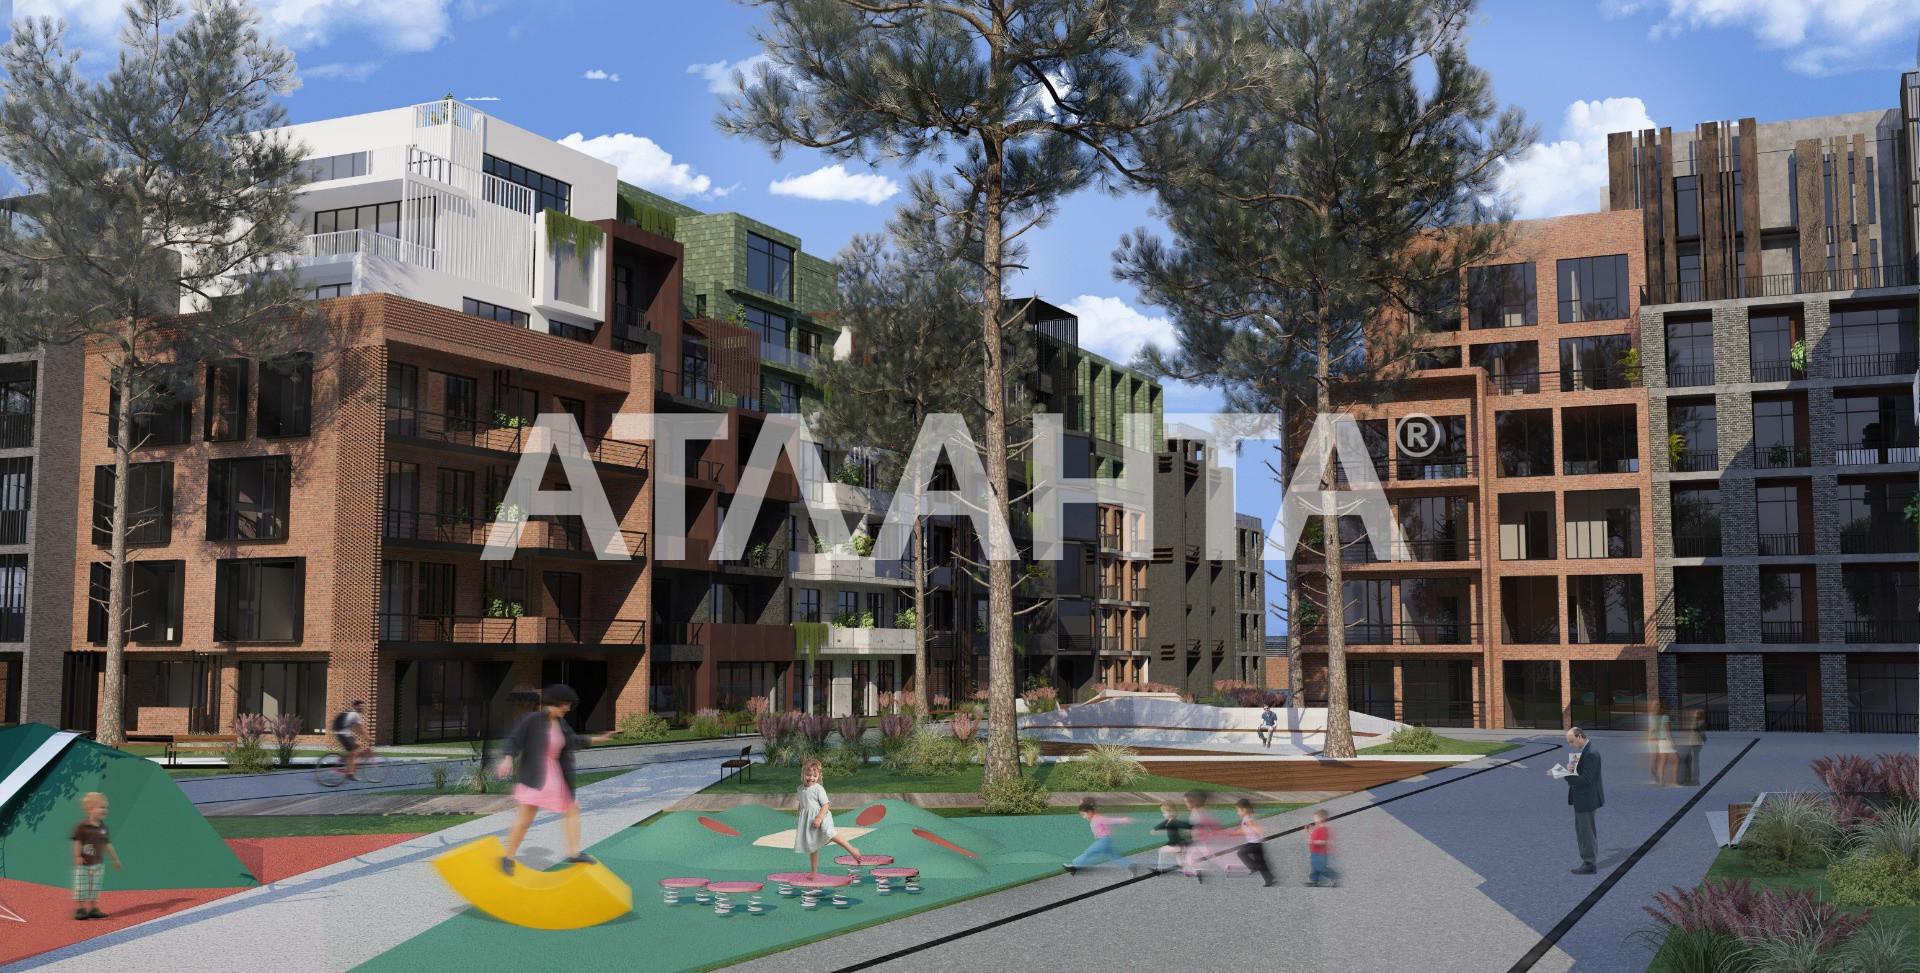 Продается 1-комнатная Квартира на ул. Донского Дмитрия — 37 760 у.е. (фото №3)